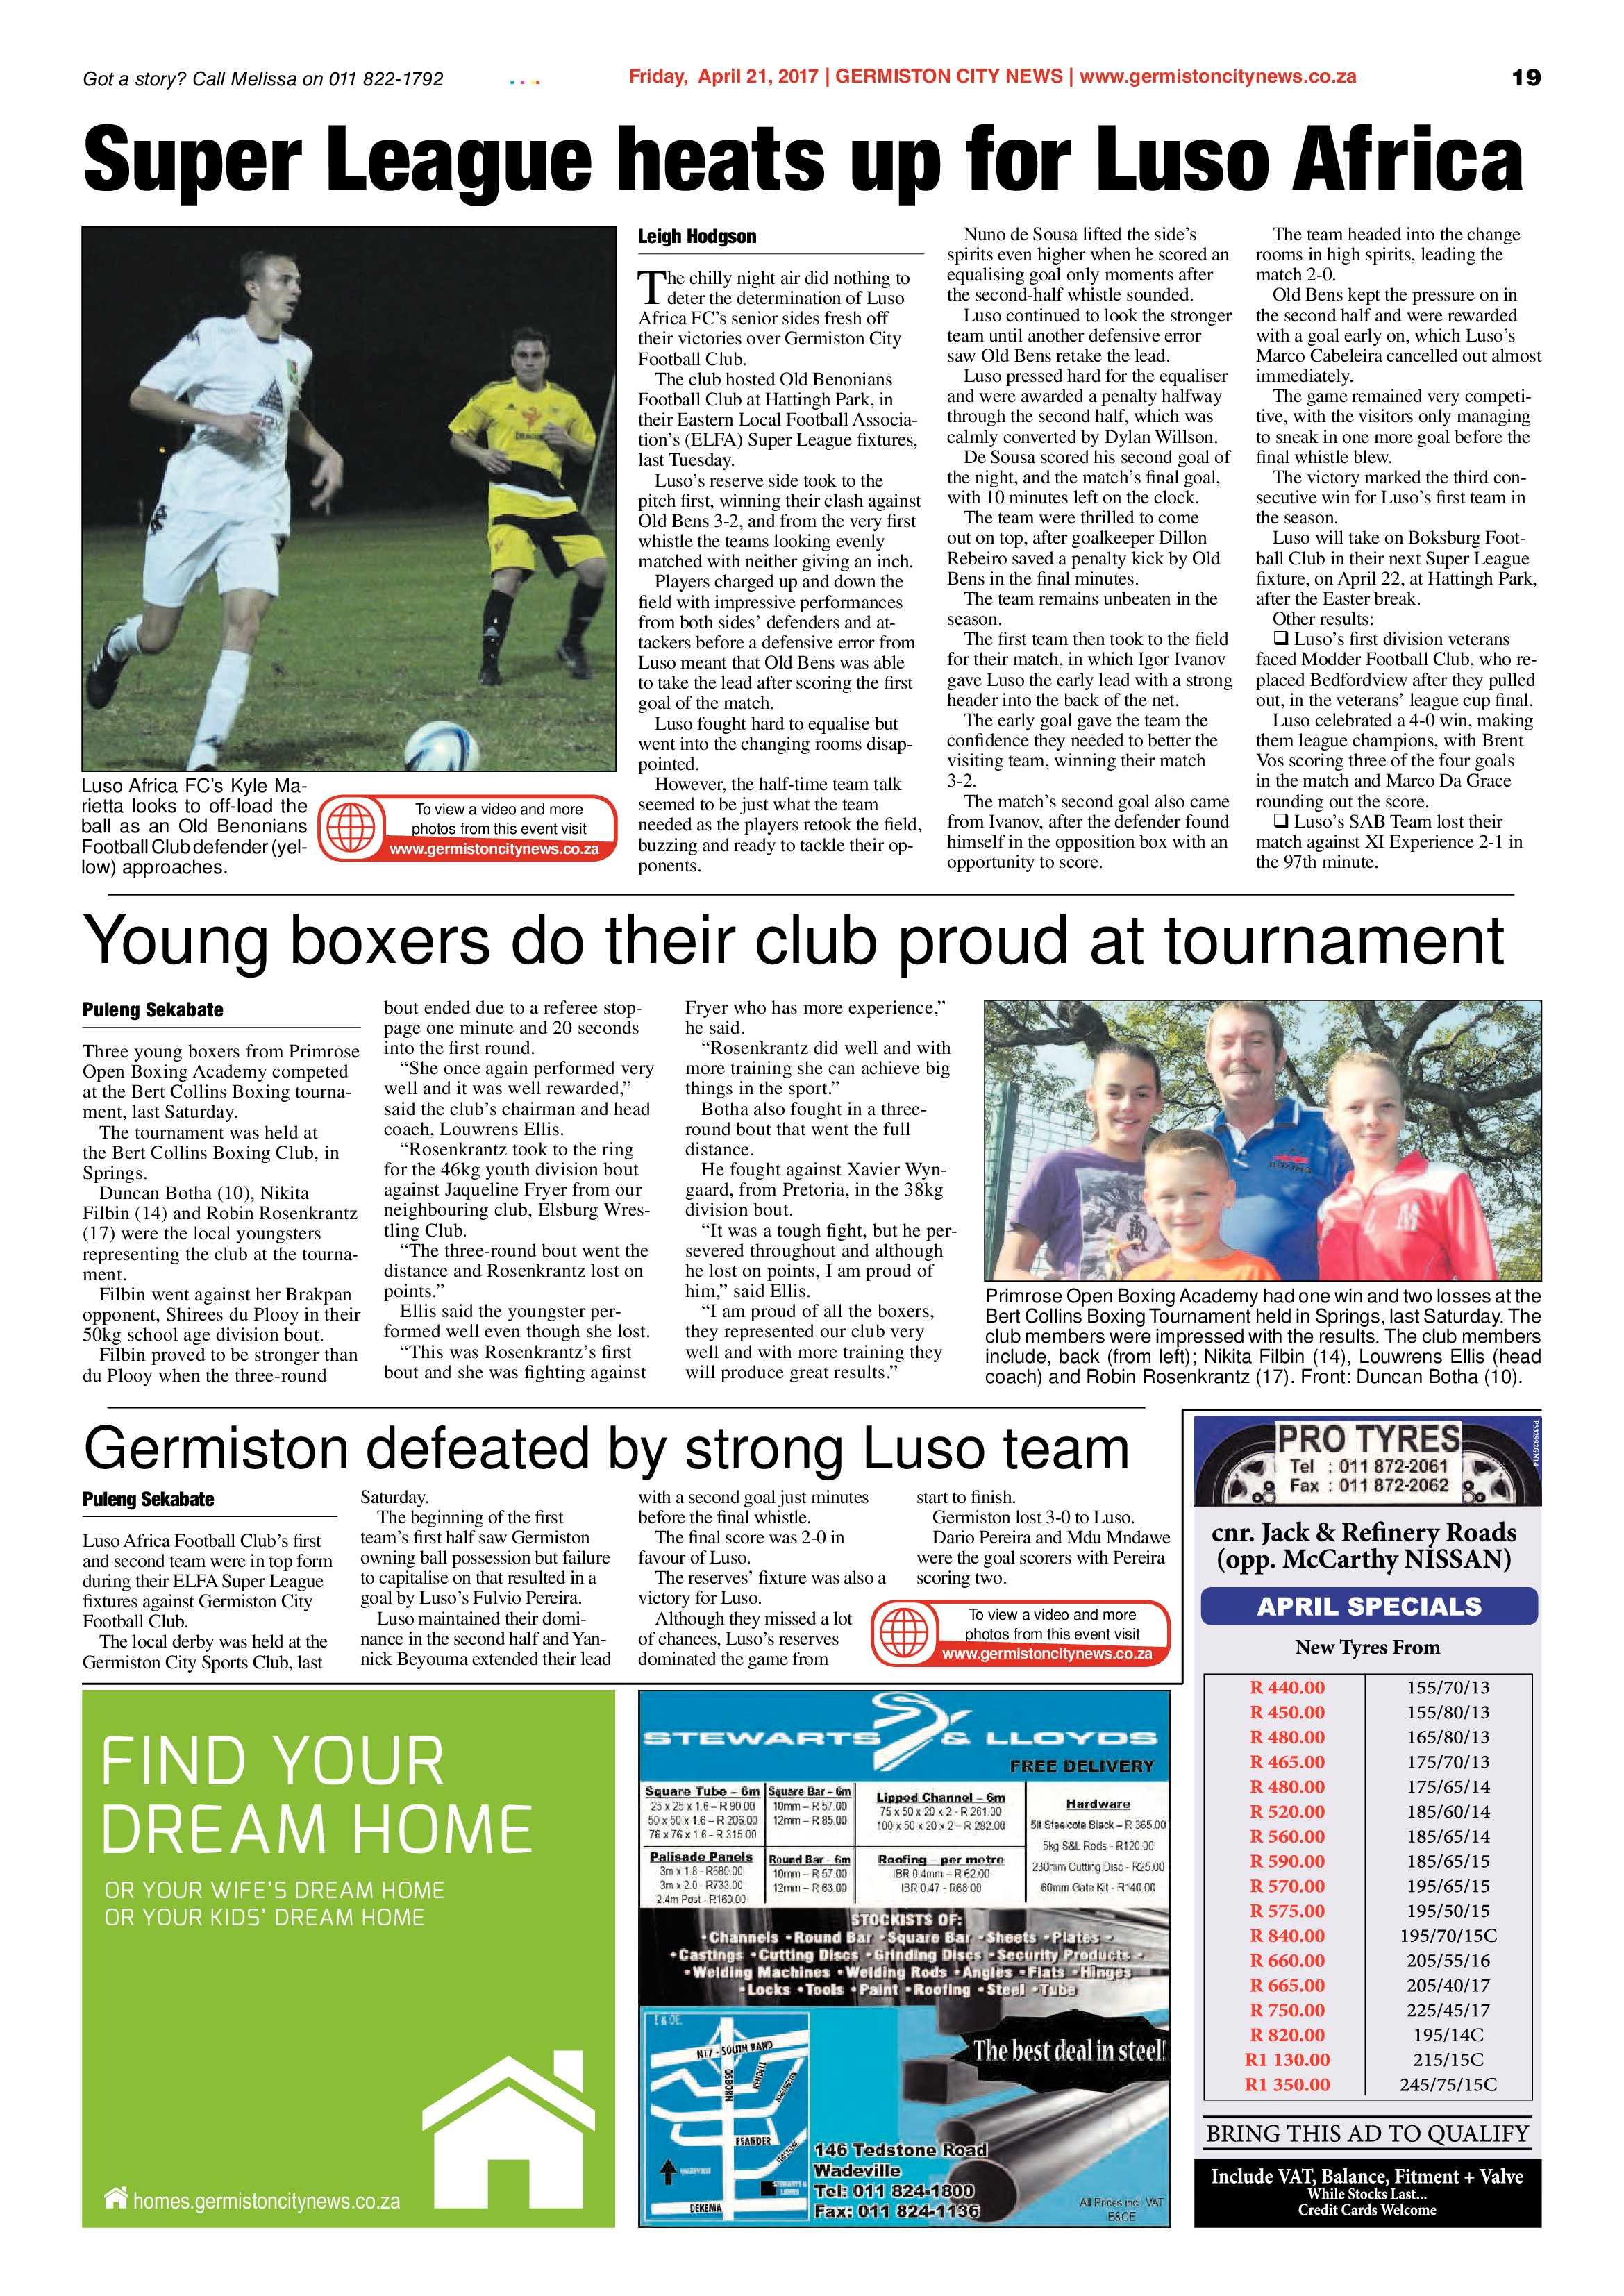 germiston-city-news-19-april-2017-epapers-page-19